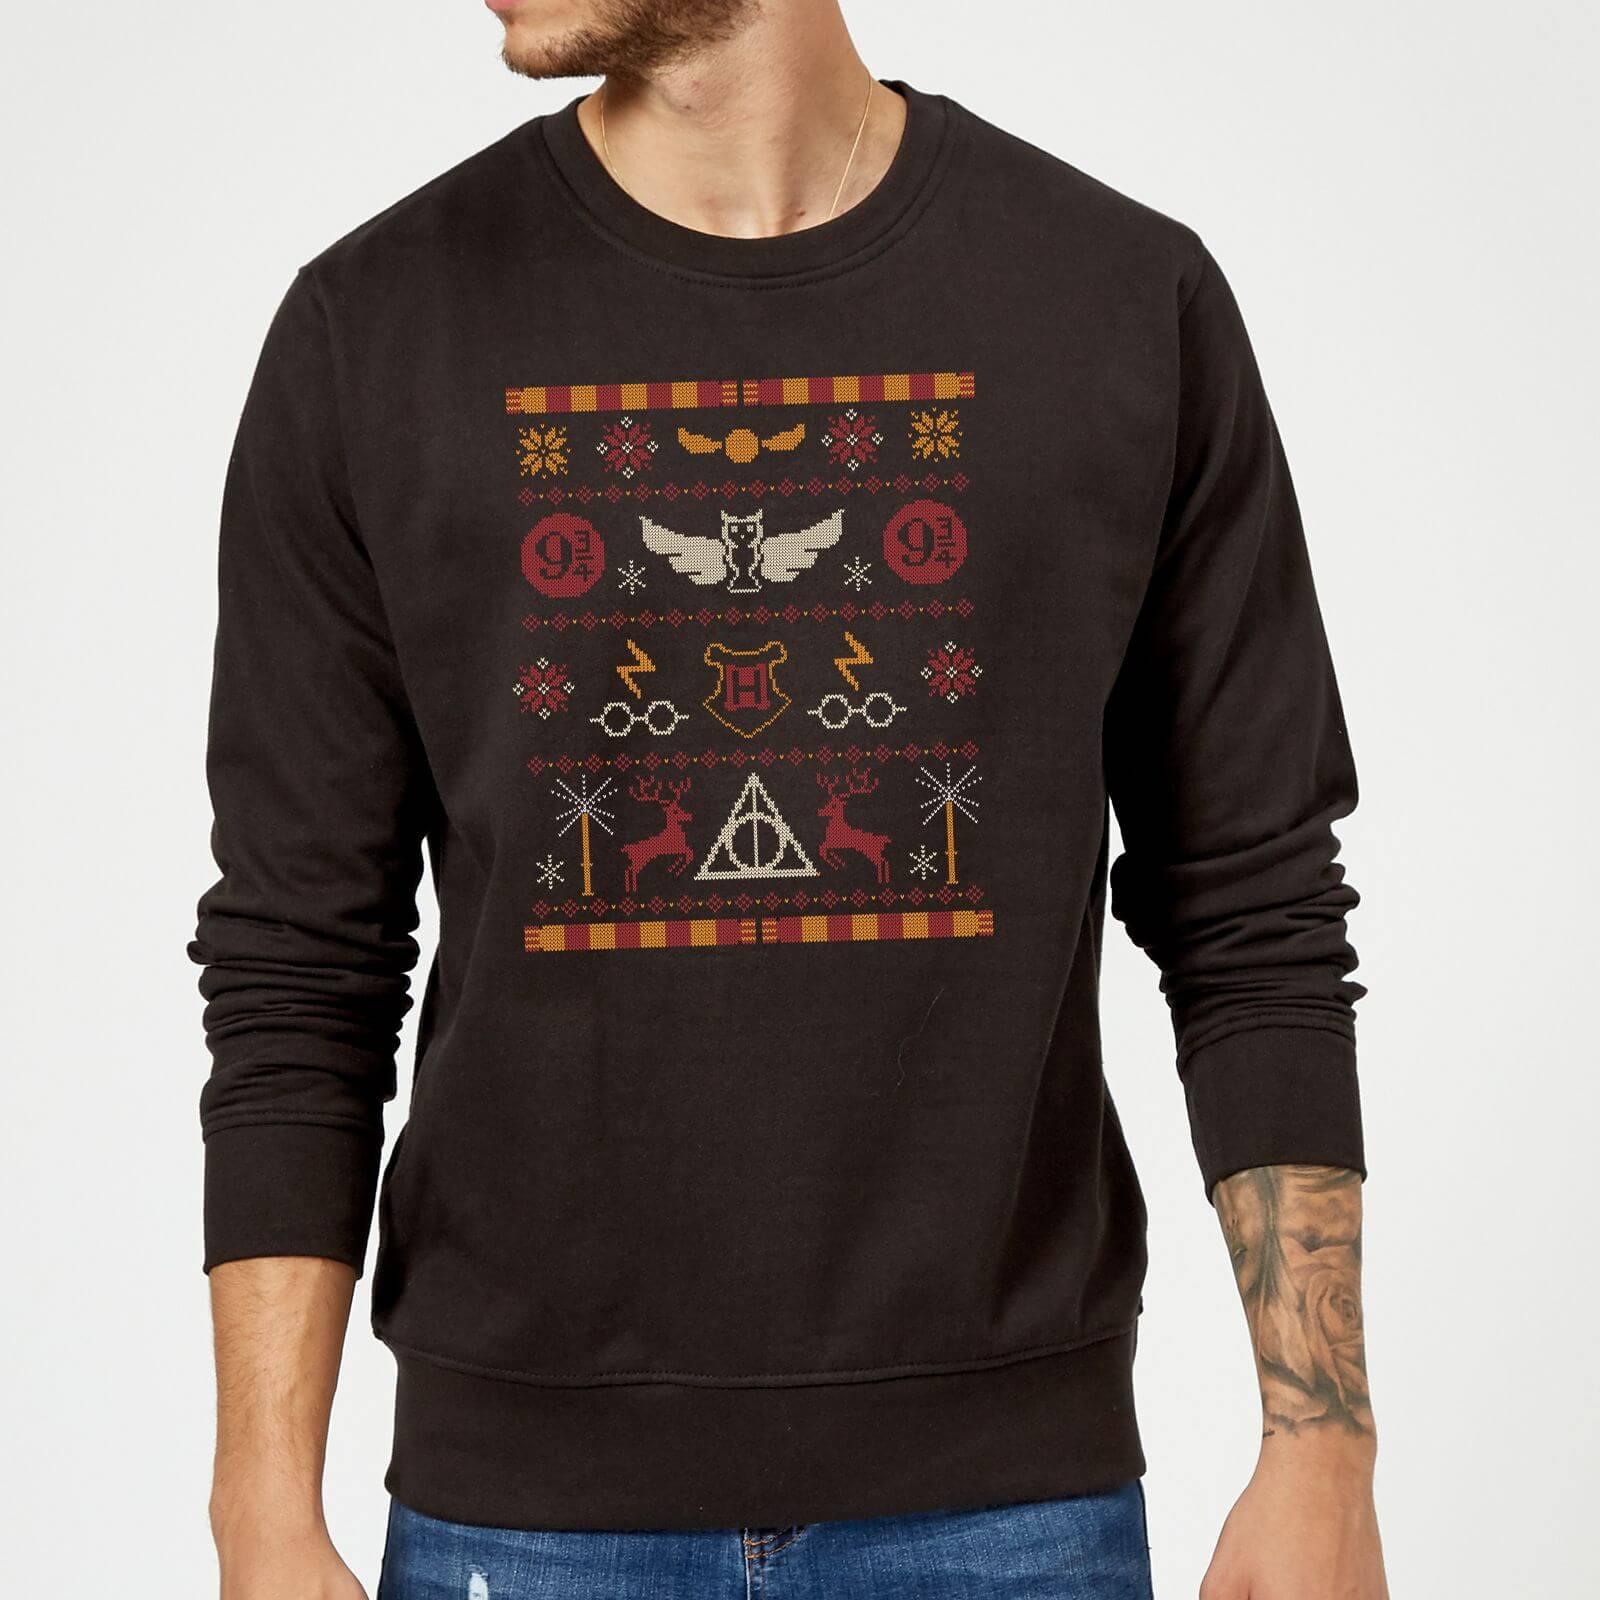 Harry Potter Knit Christmas Sweatshirt Black Iwoot